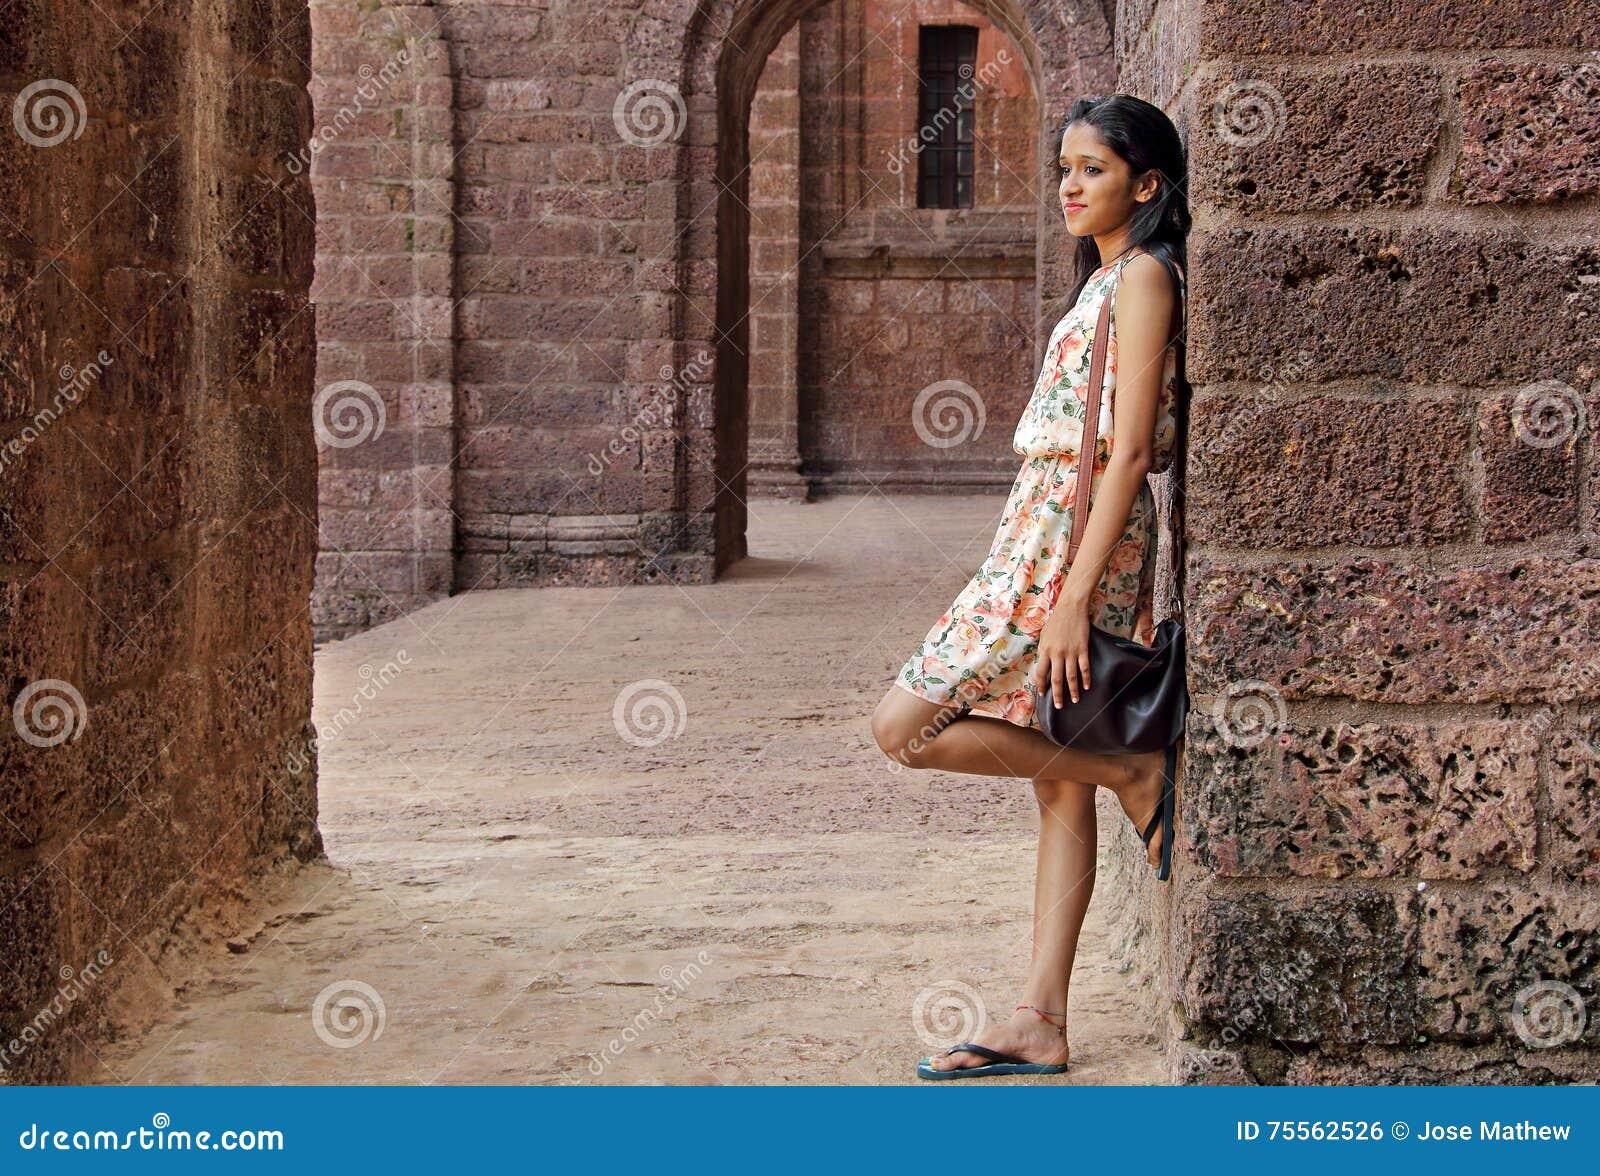 Pleasant Teenage Girl in Brick Courtyard